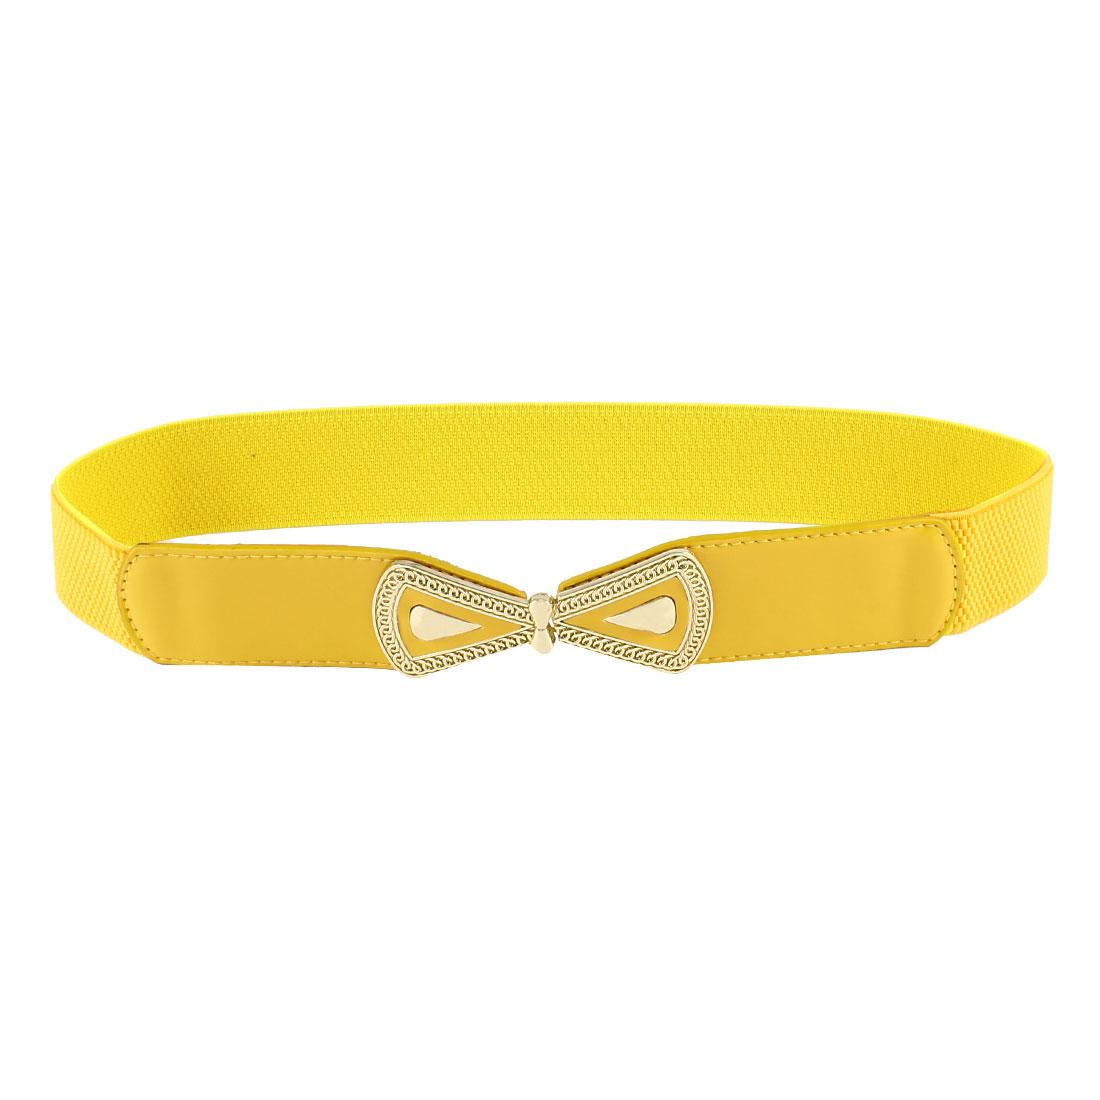 Ladies Bowtie Interlock Buckle Faux Leather Waistband Skinny Waist Belt Yellow